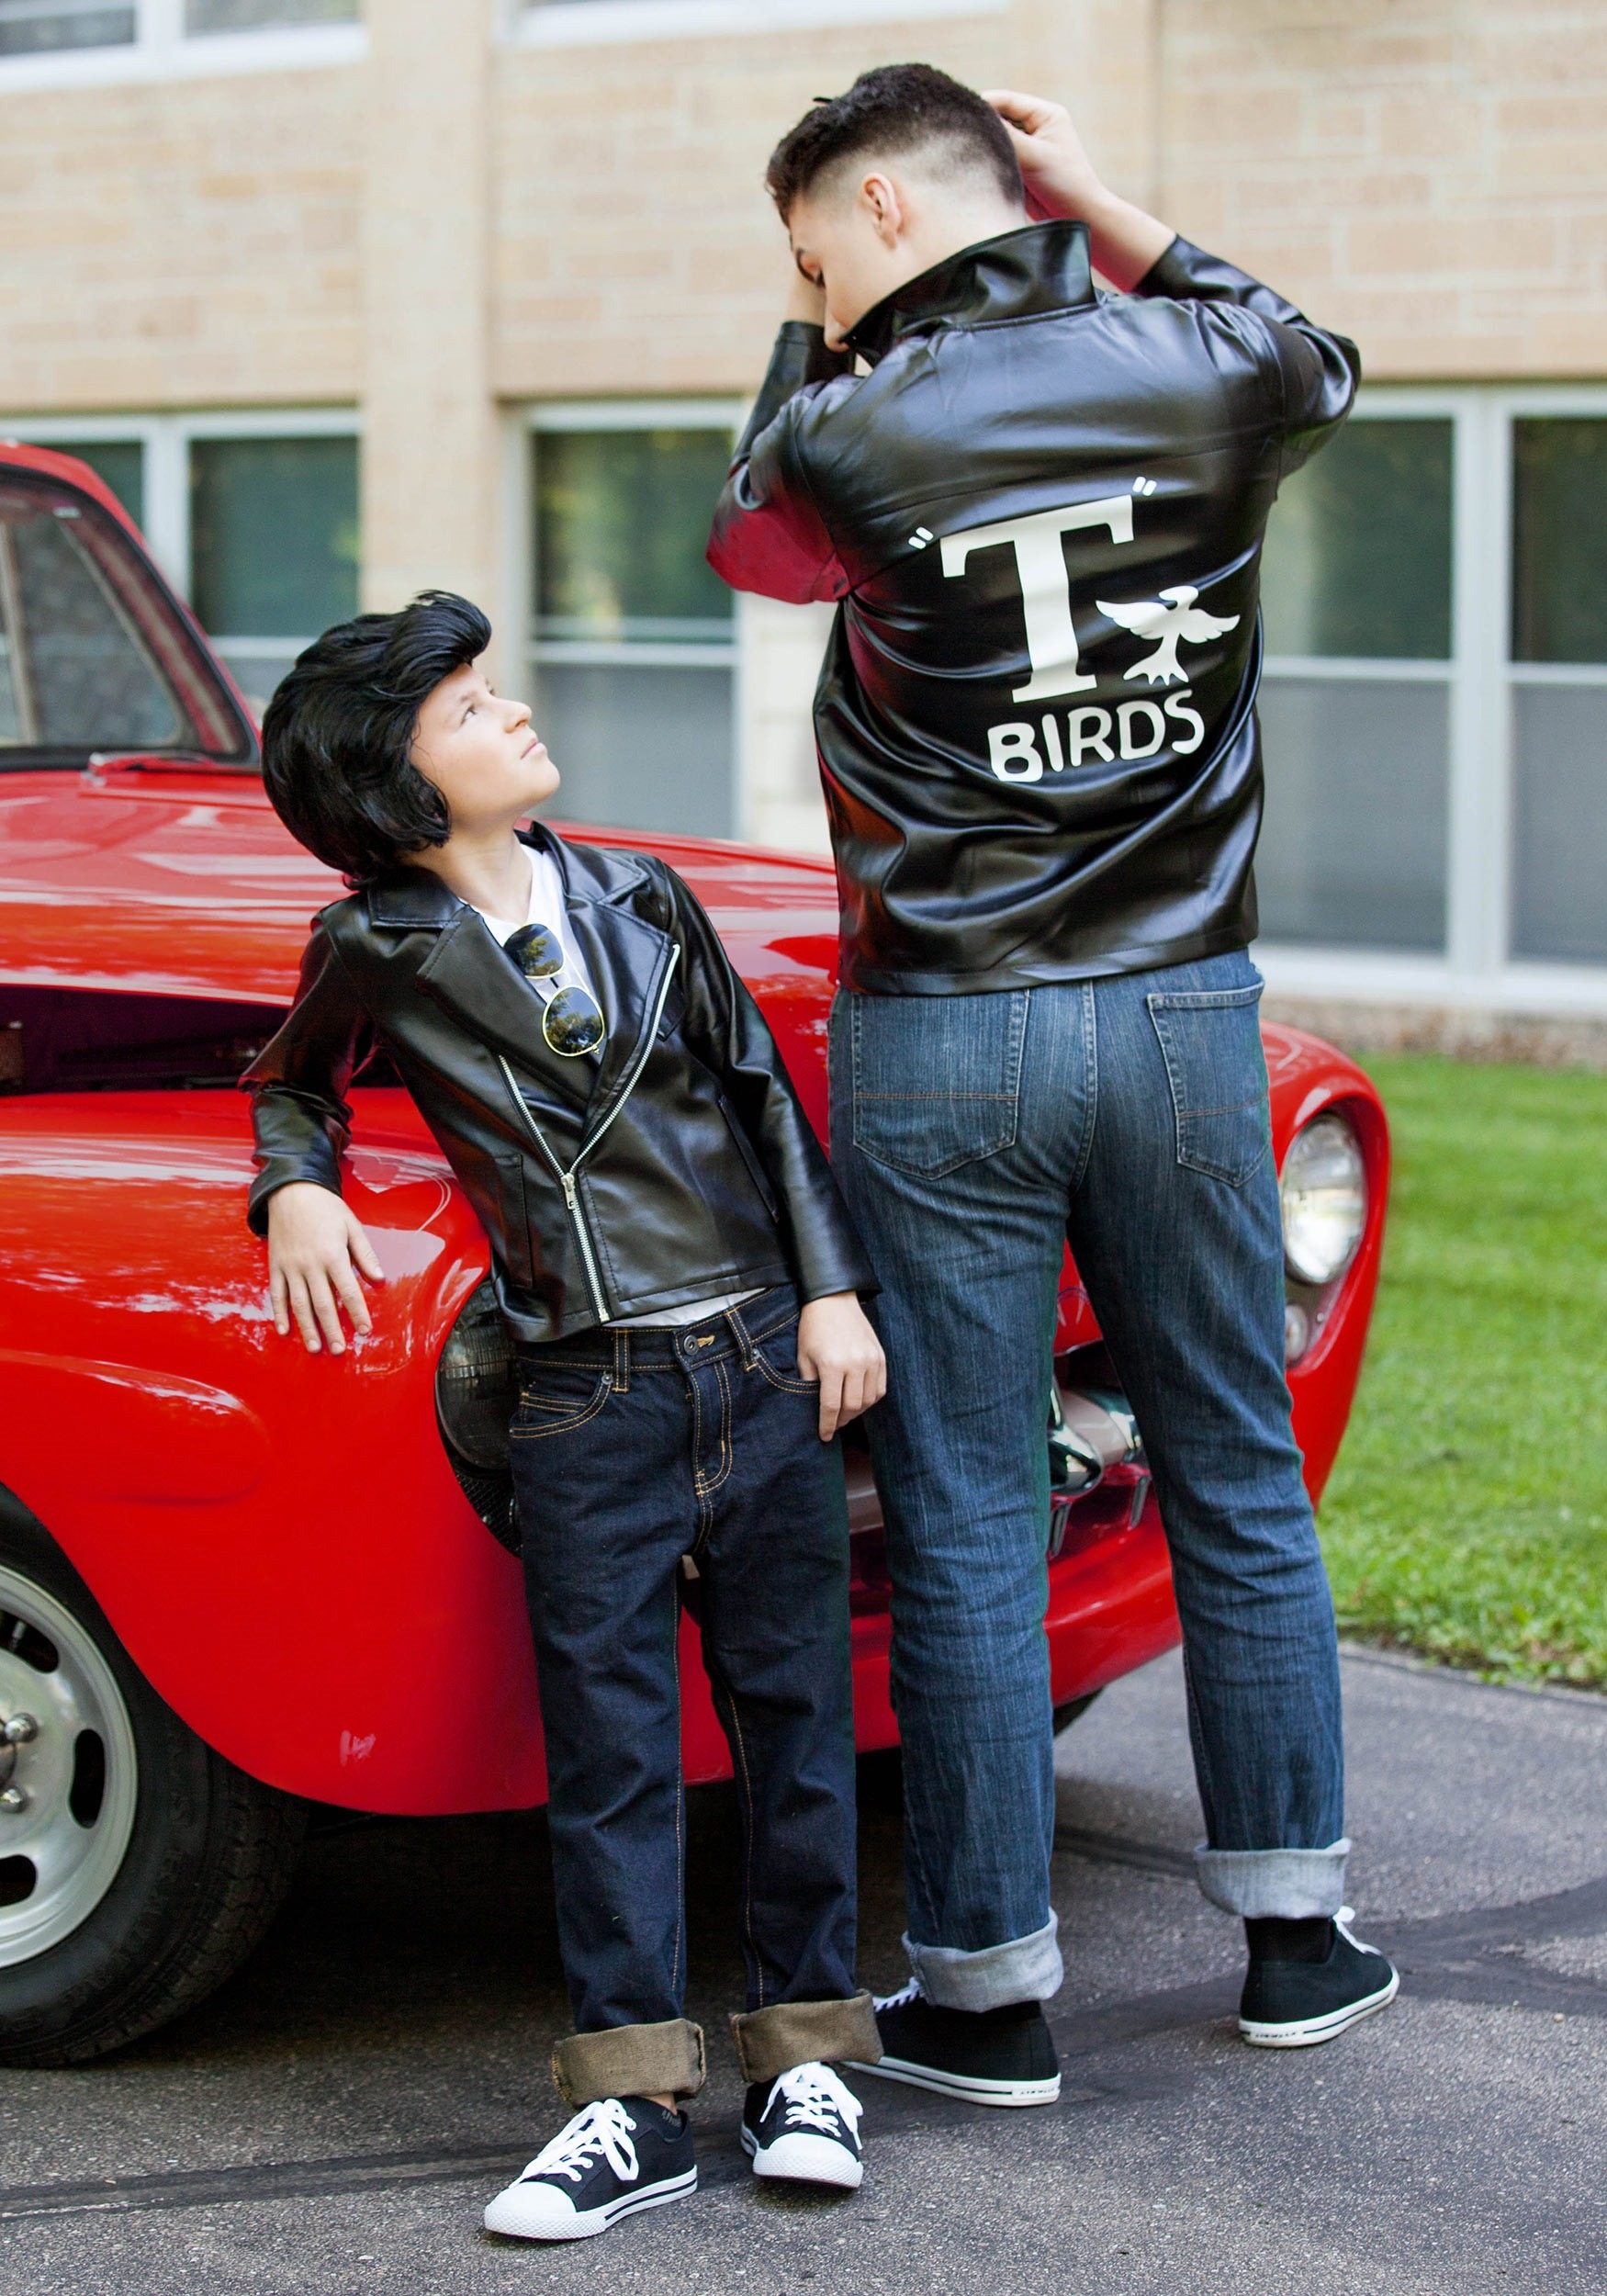 Kids Grease T Birds Jacket Costume